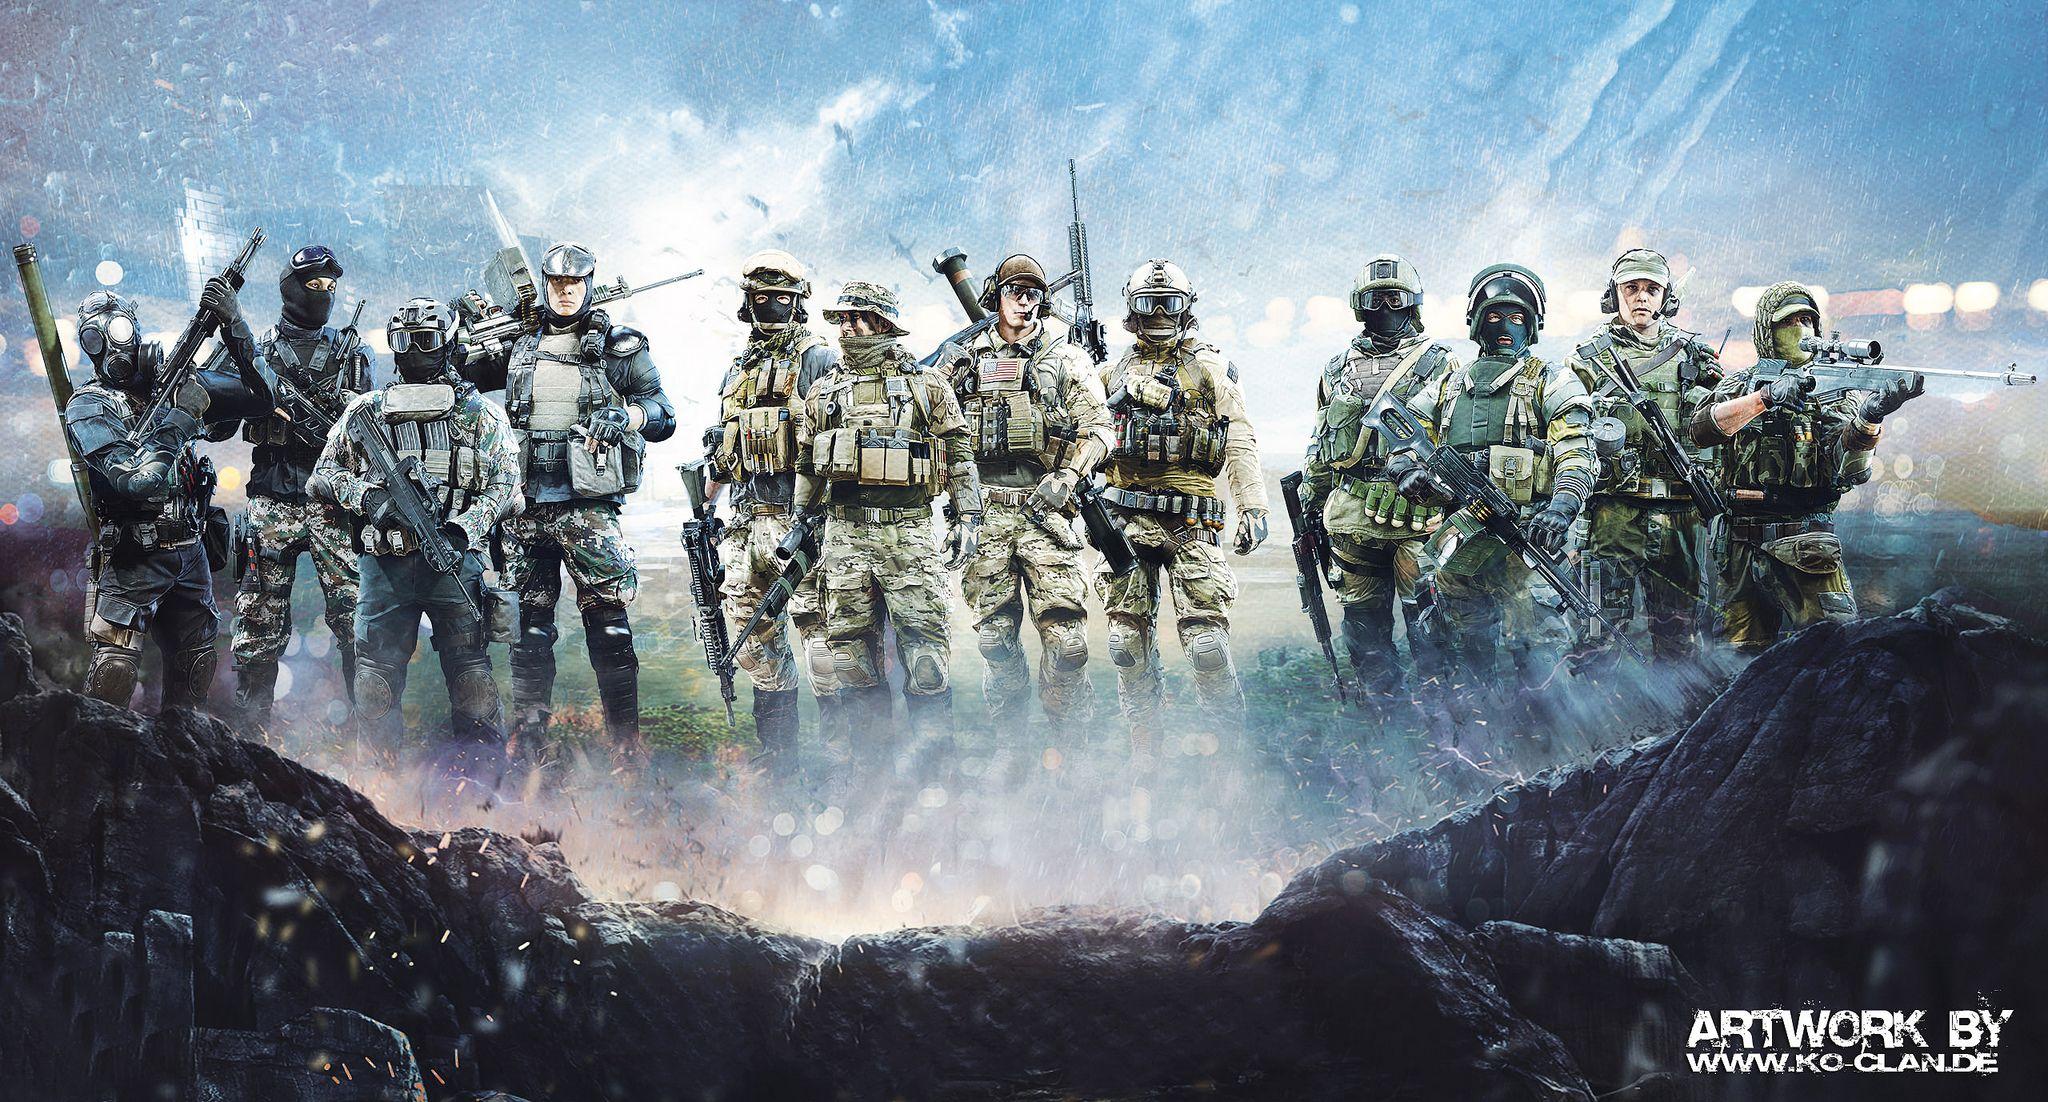 Battlefield 4 Soldiers Wallpaper Artwork